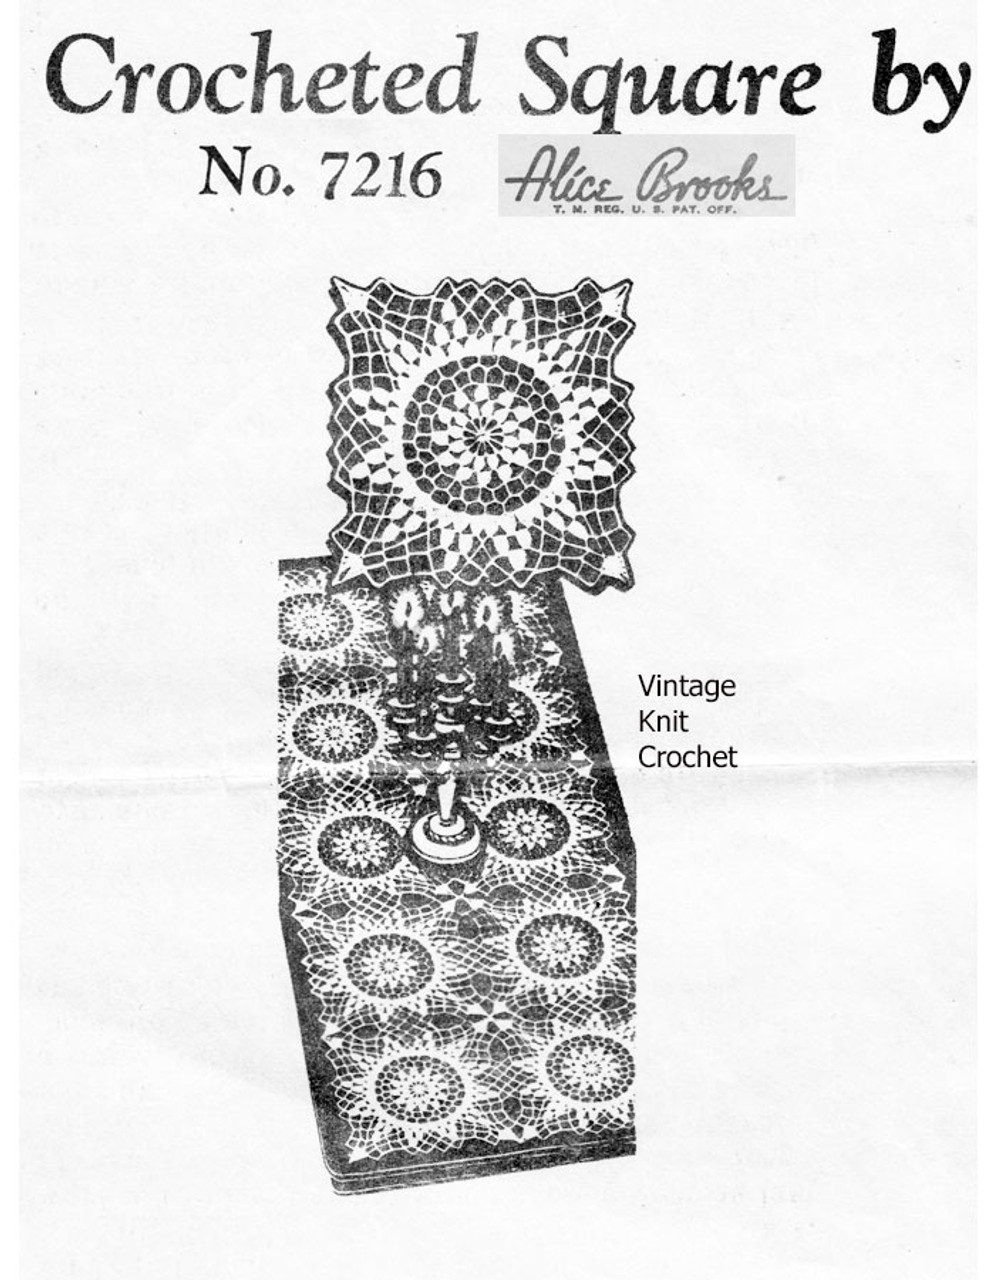 Crochet Bedspread Square Pattern, Alice Brooks 7216